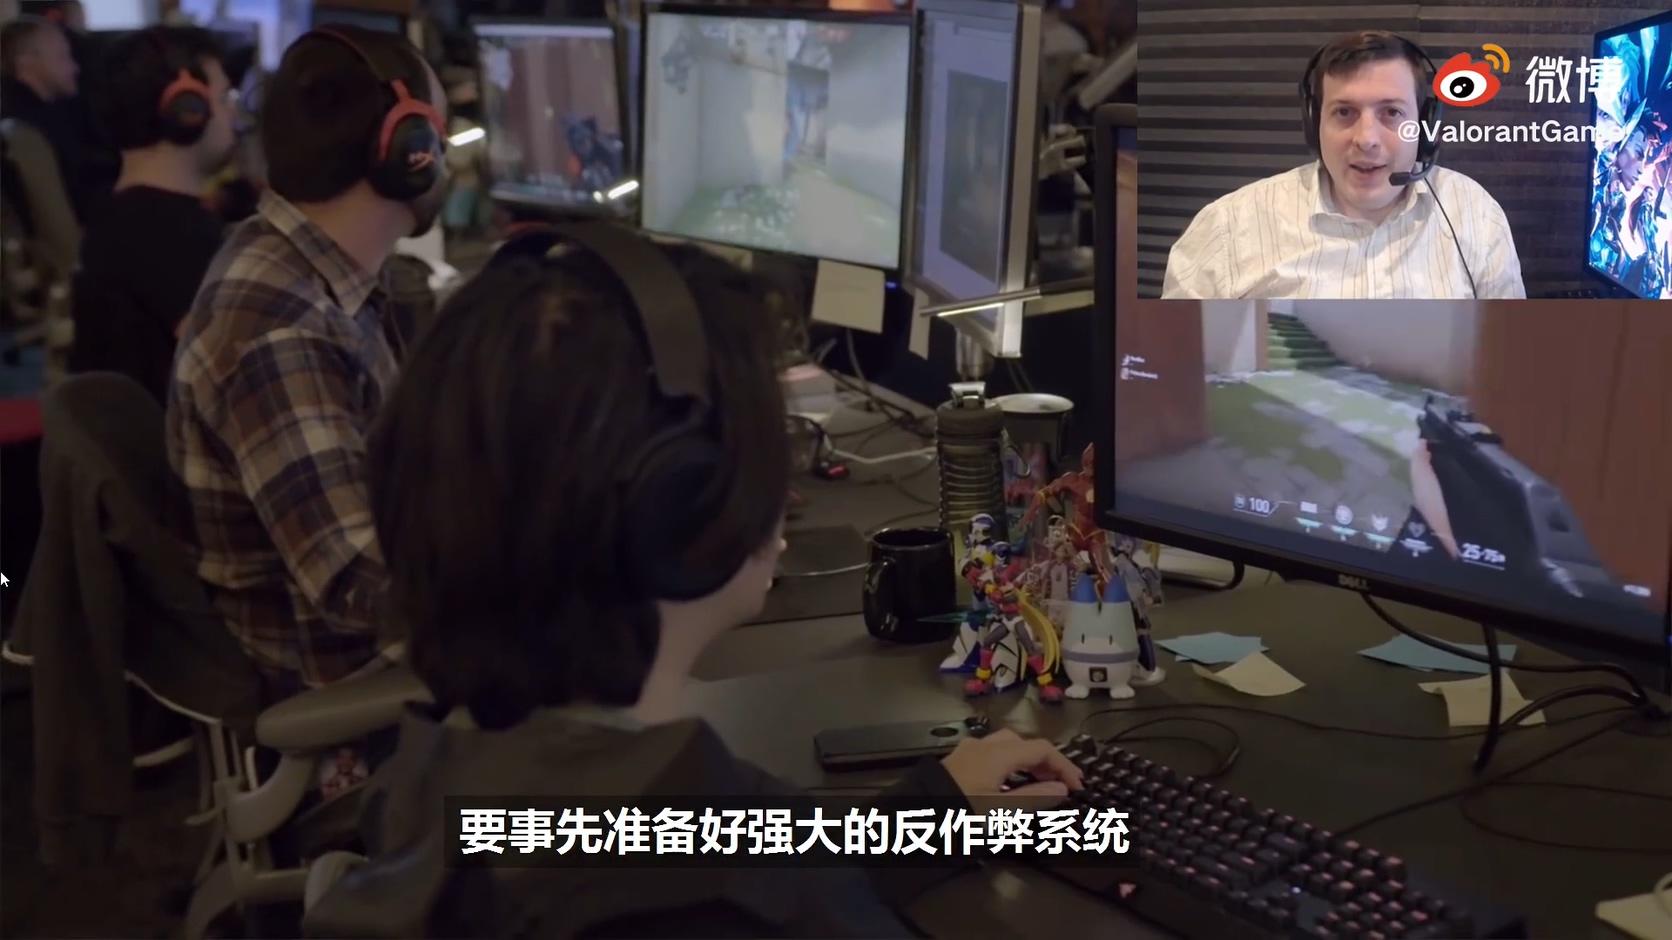 《Valorant》谈反作弊:做最重视玩家的FPS游戏